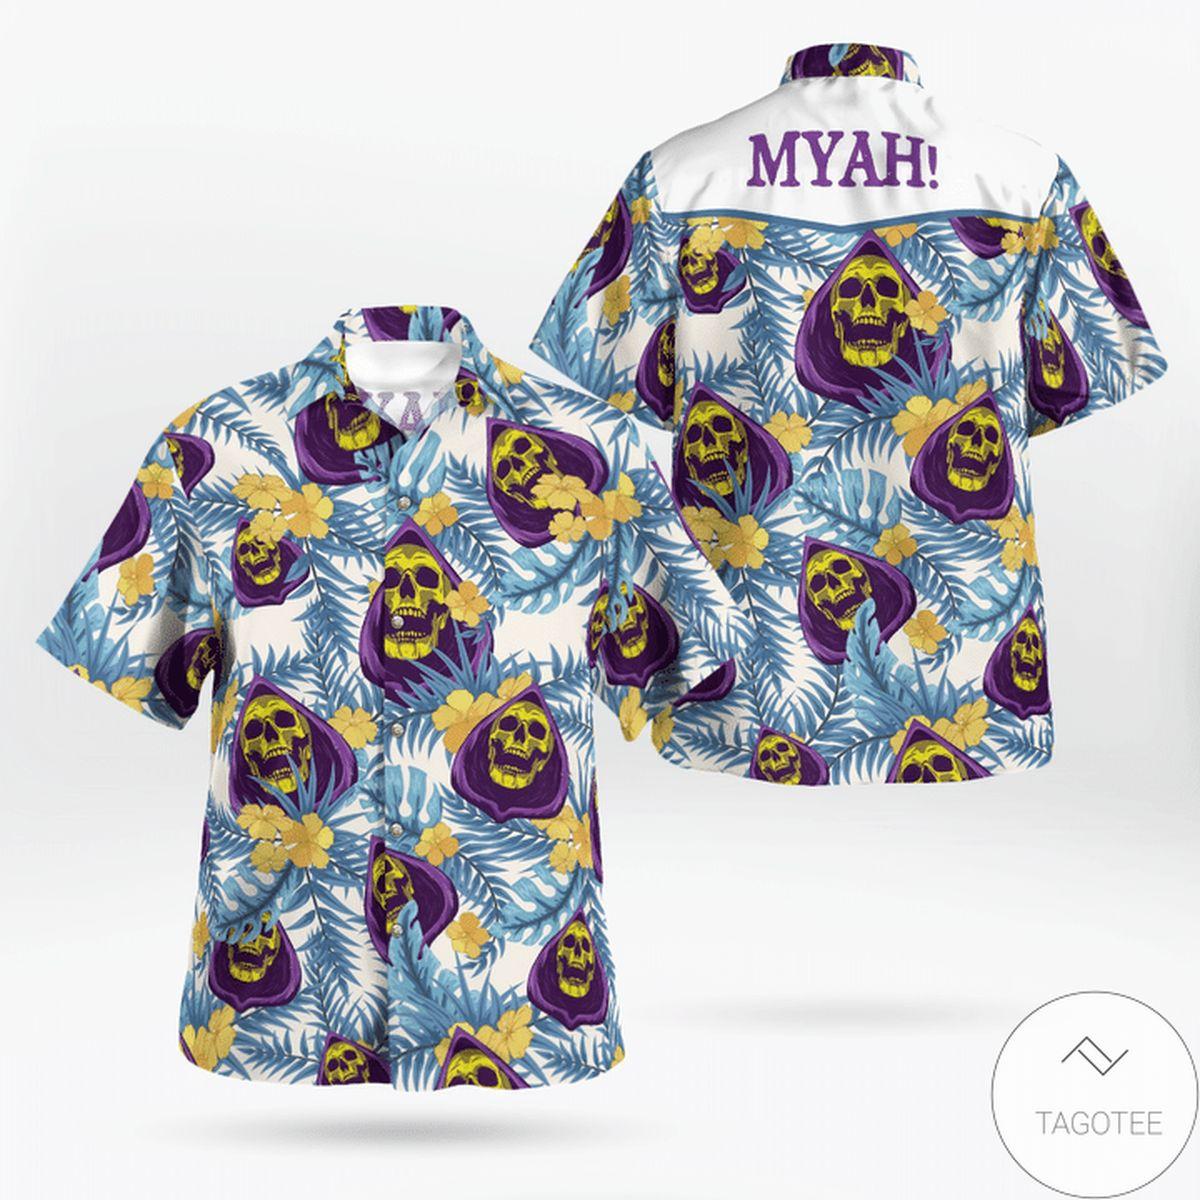 Free Skeletor Myah Hawaiian Shirt